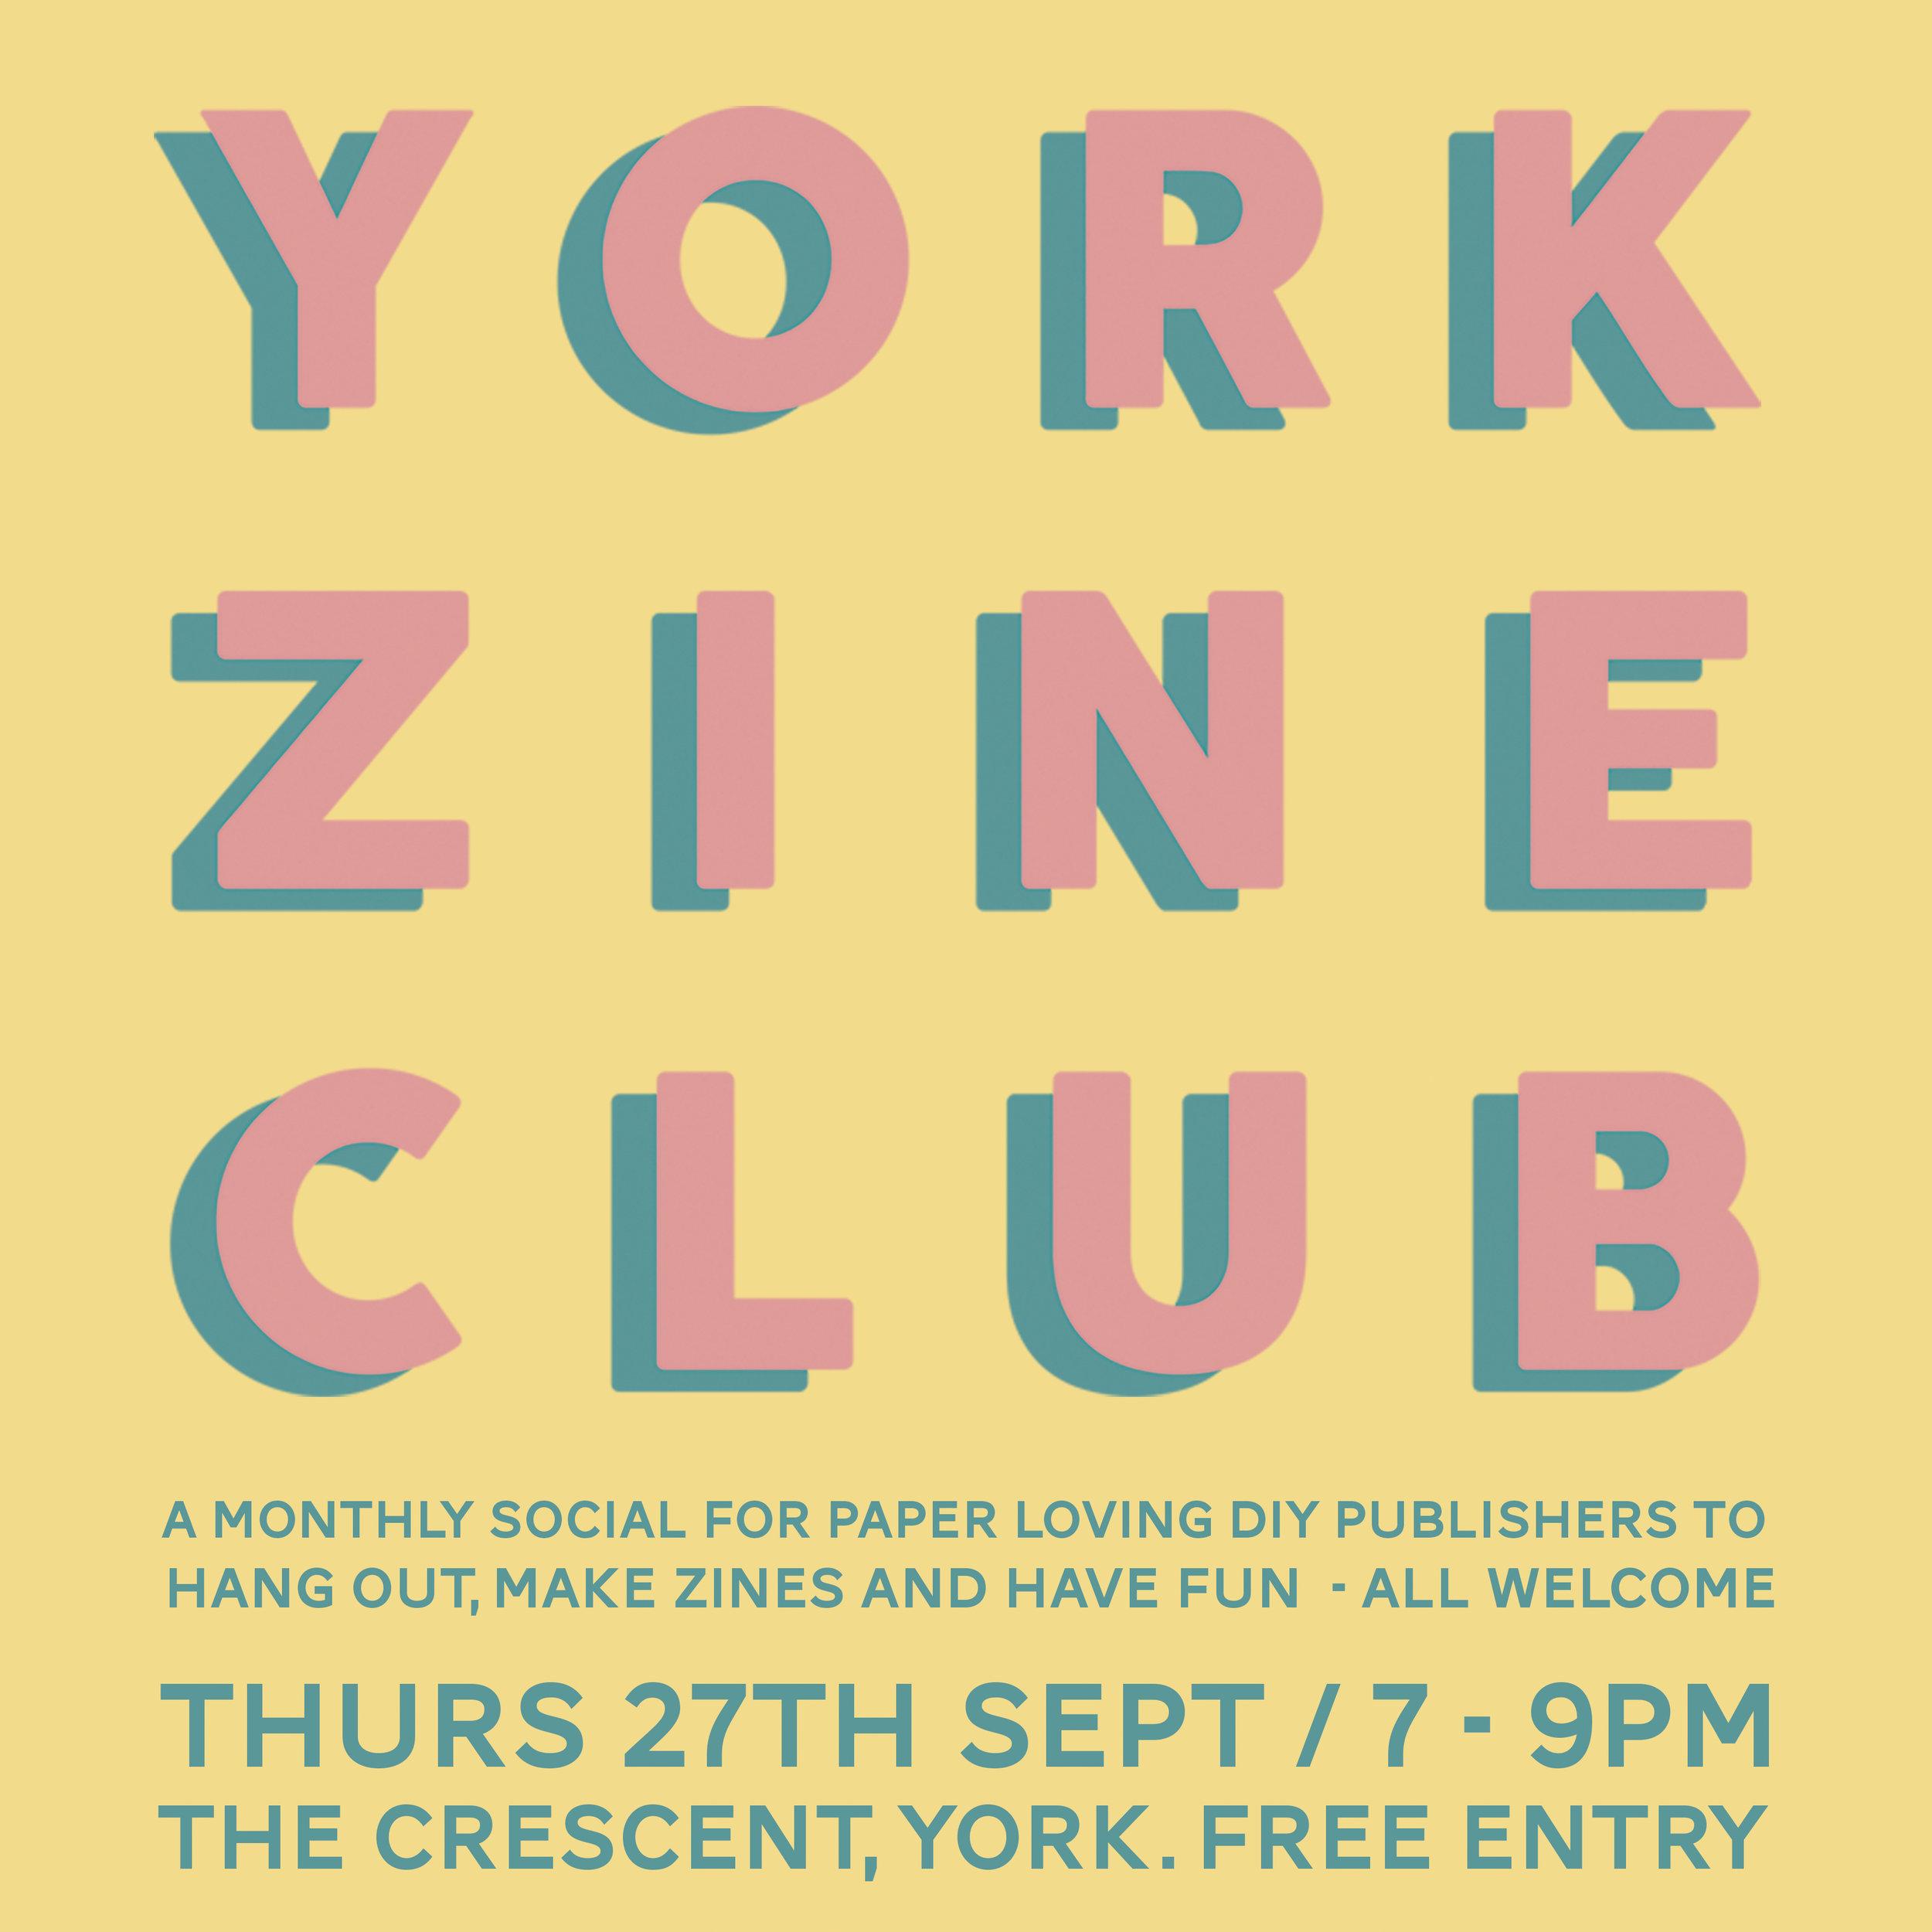 THURS 27TH SEPTEMBER -  YORK ZINE CLUB